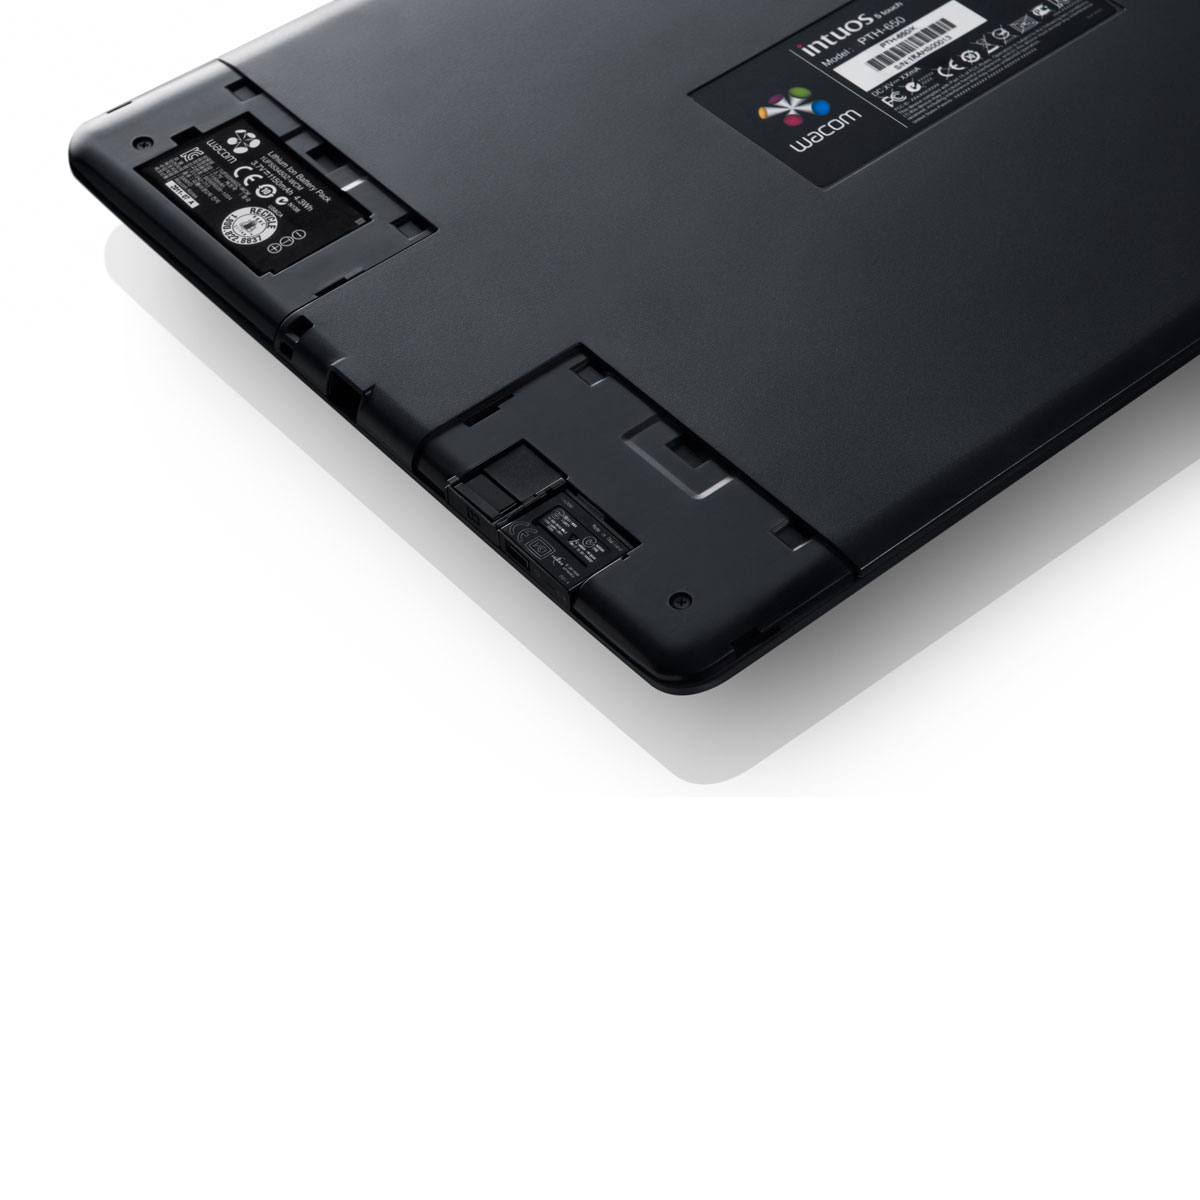 wacom intuos 5 m tablette graphique wacom sur ldlc. Black Bedroom Furniture Sets. Home Design Ideas